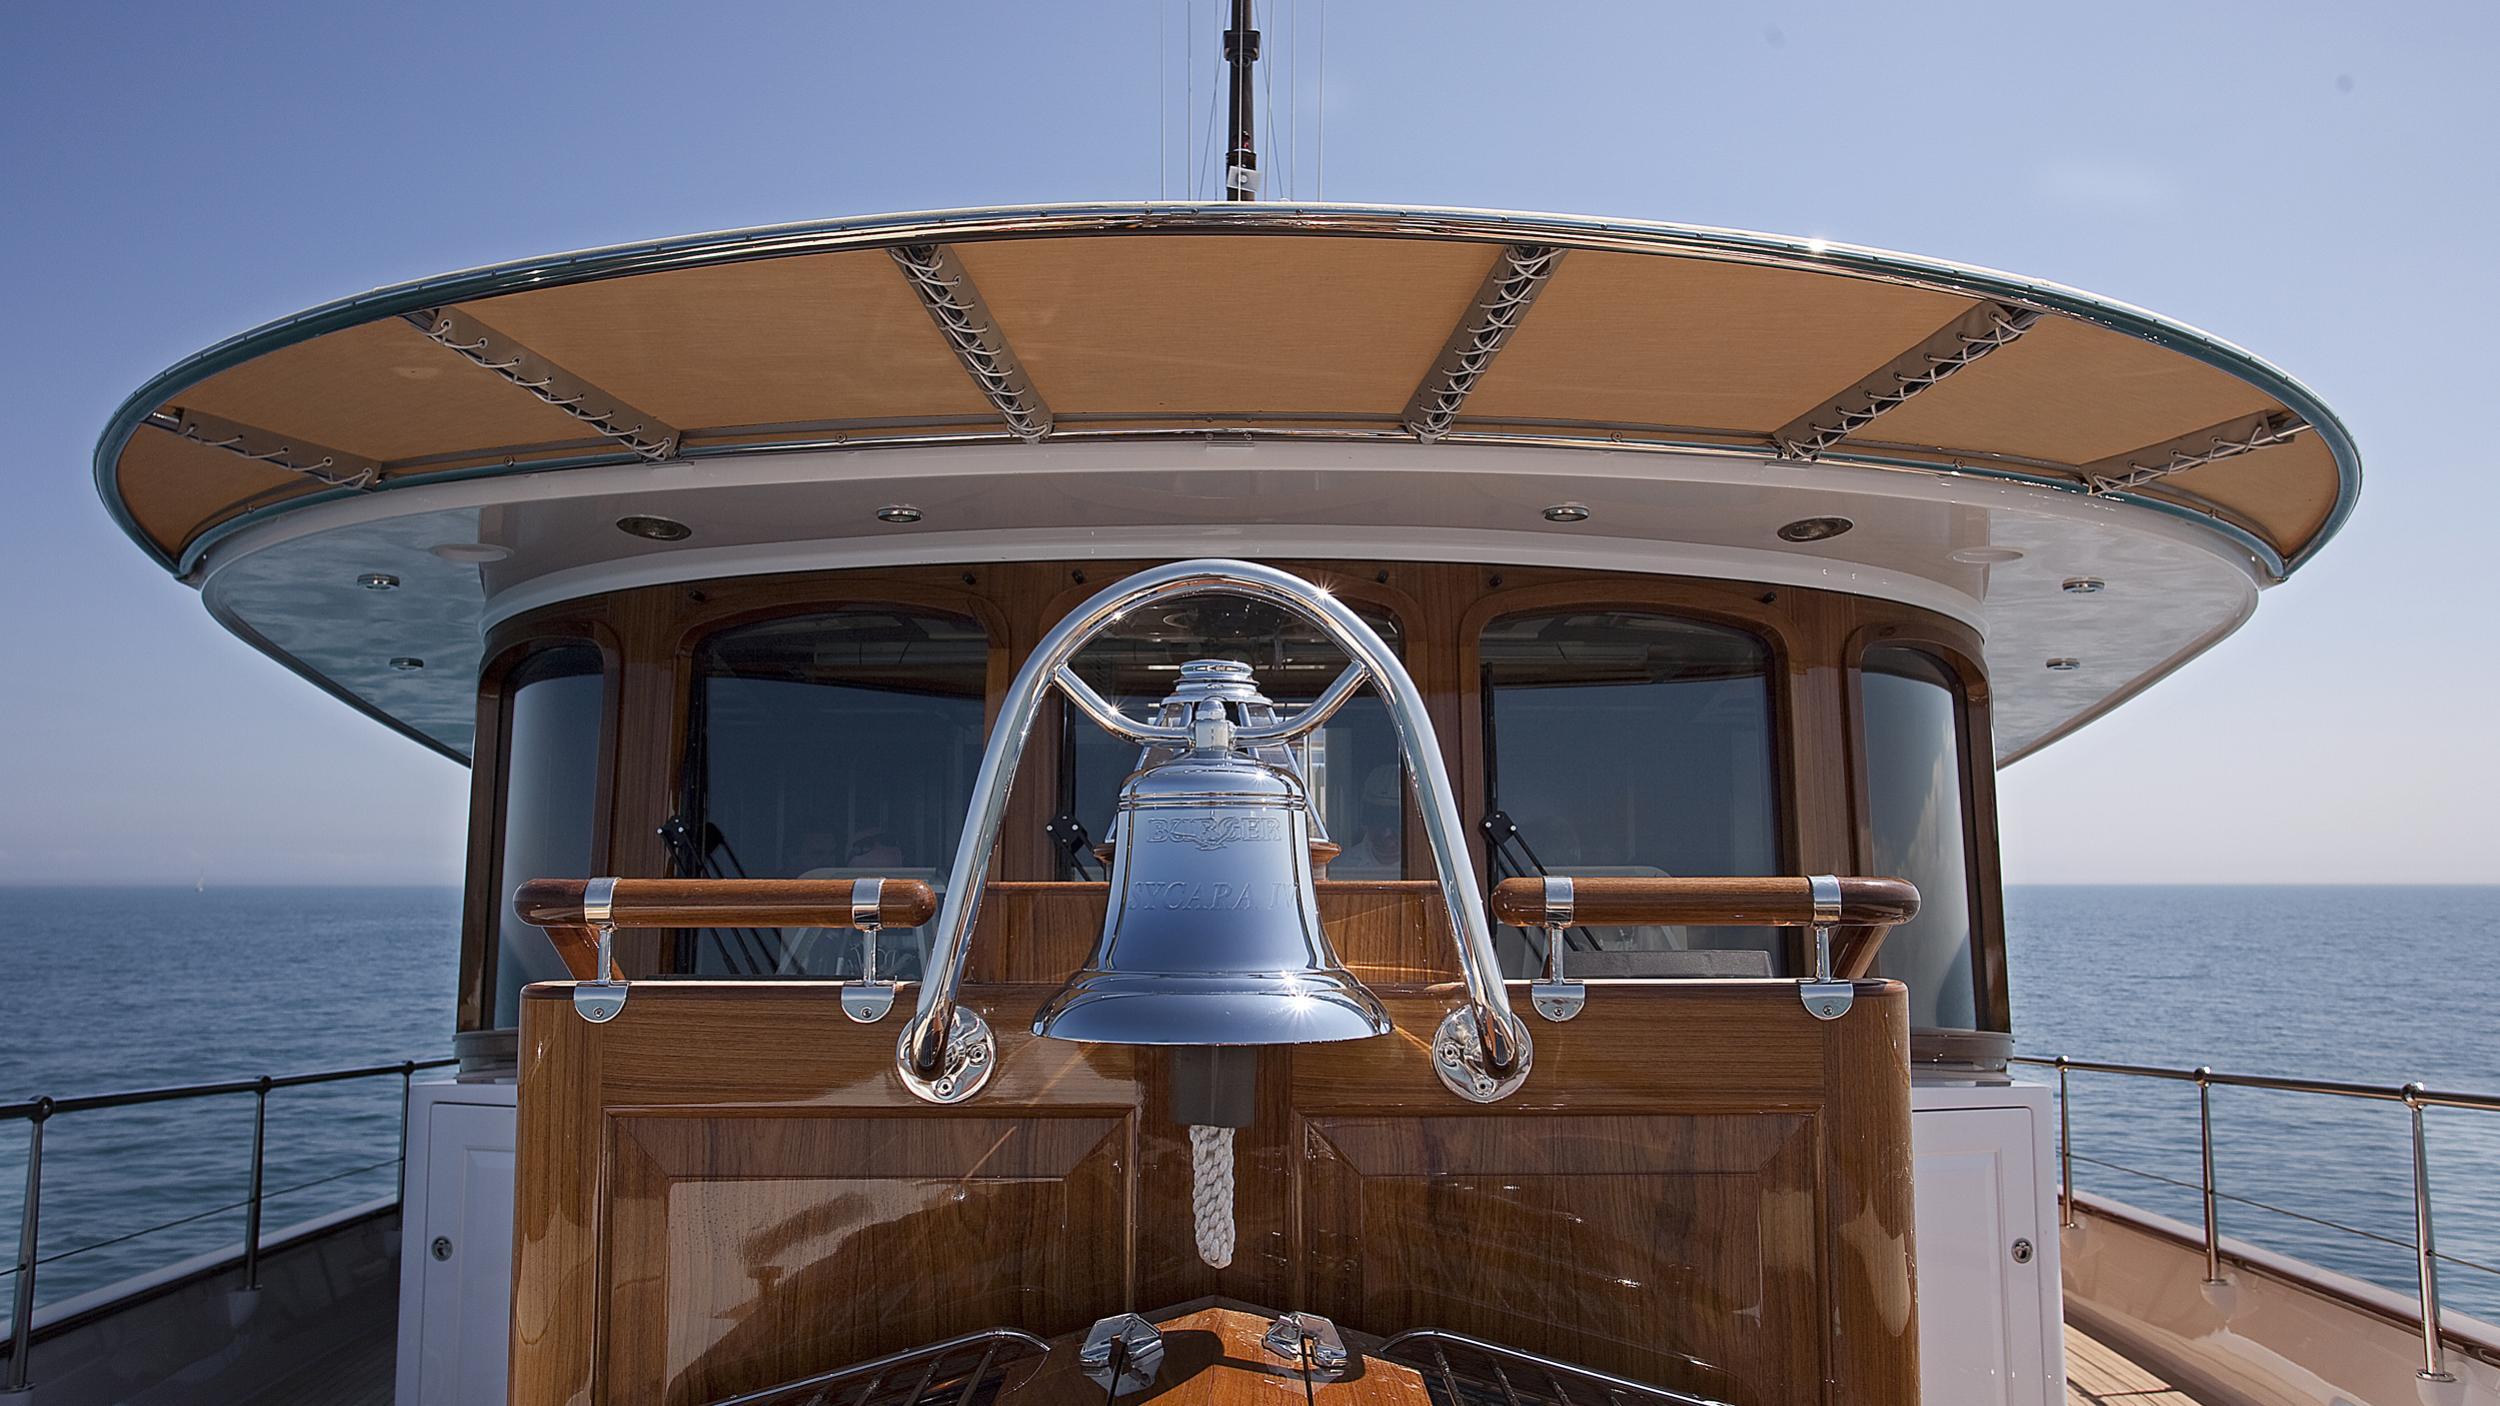 nadan sycara iv motoryacht burger boat 46m 2009 wheelhouse